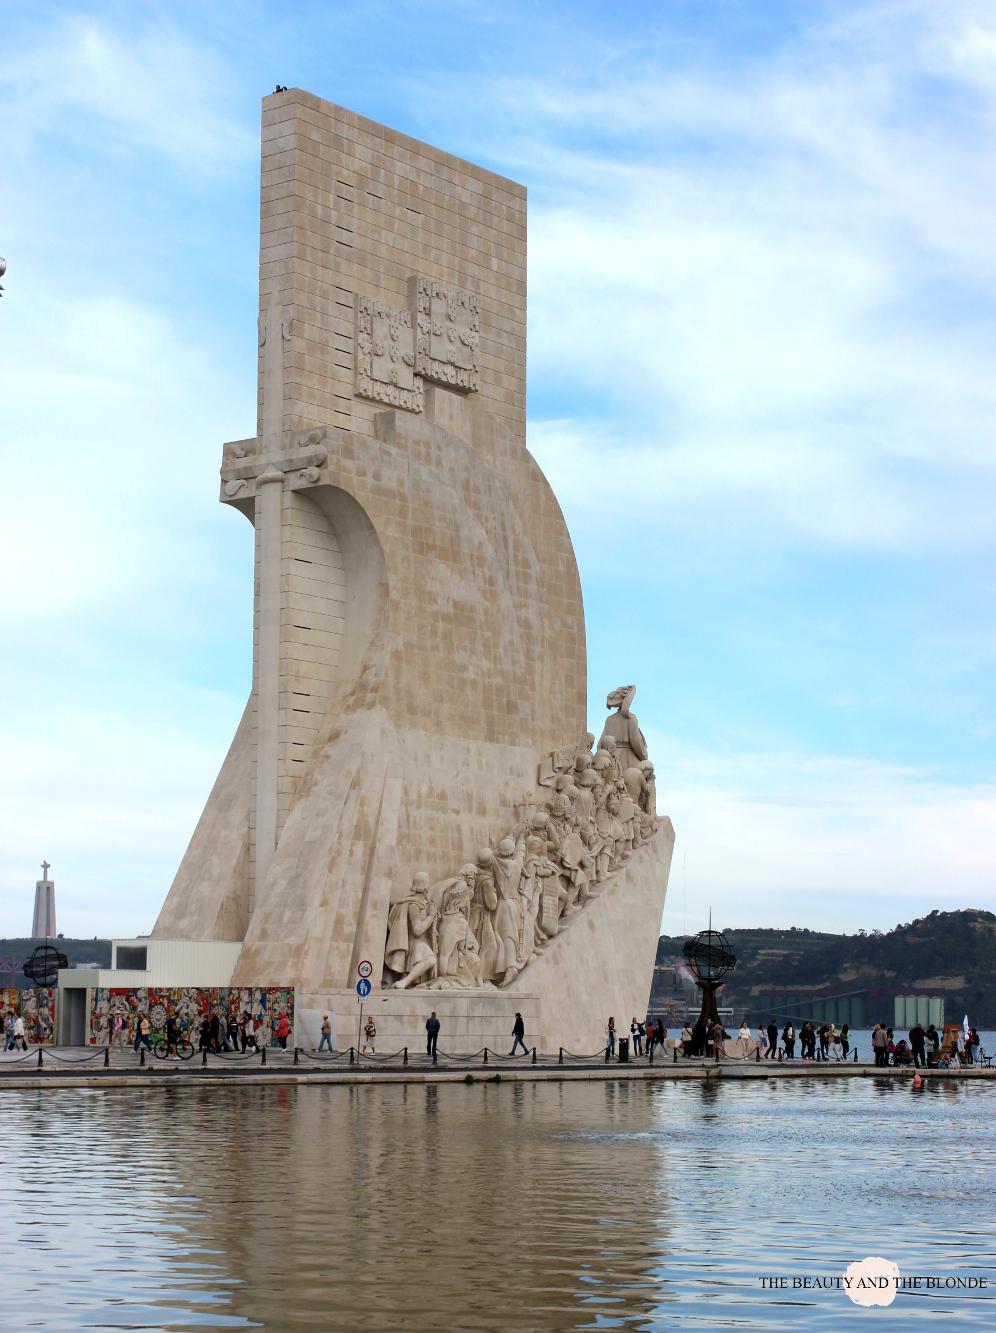 Lissabon Lisbon Lisboa Travel Diary Reise Bericht Tipps Padrao de Descobrimentos Seefahrer Denkmal